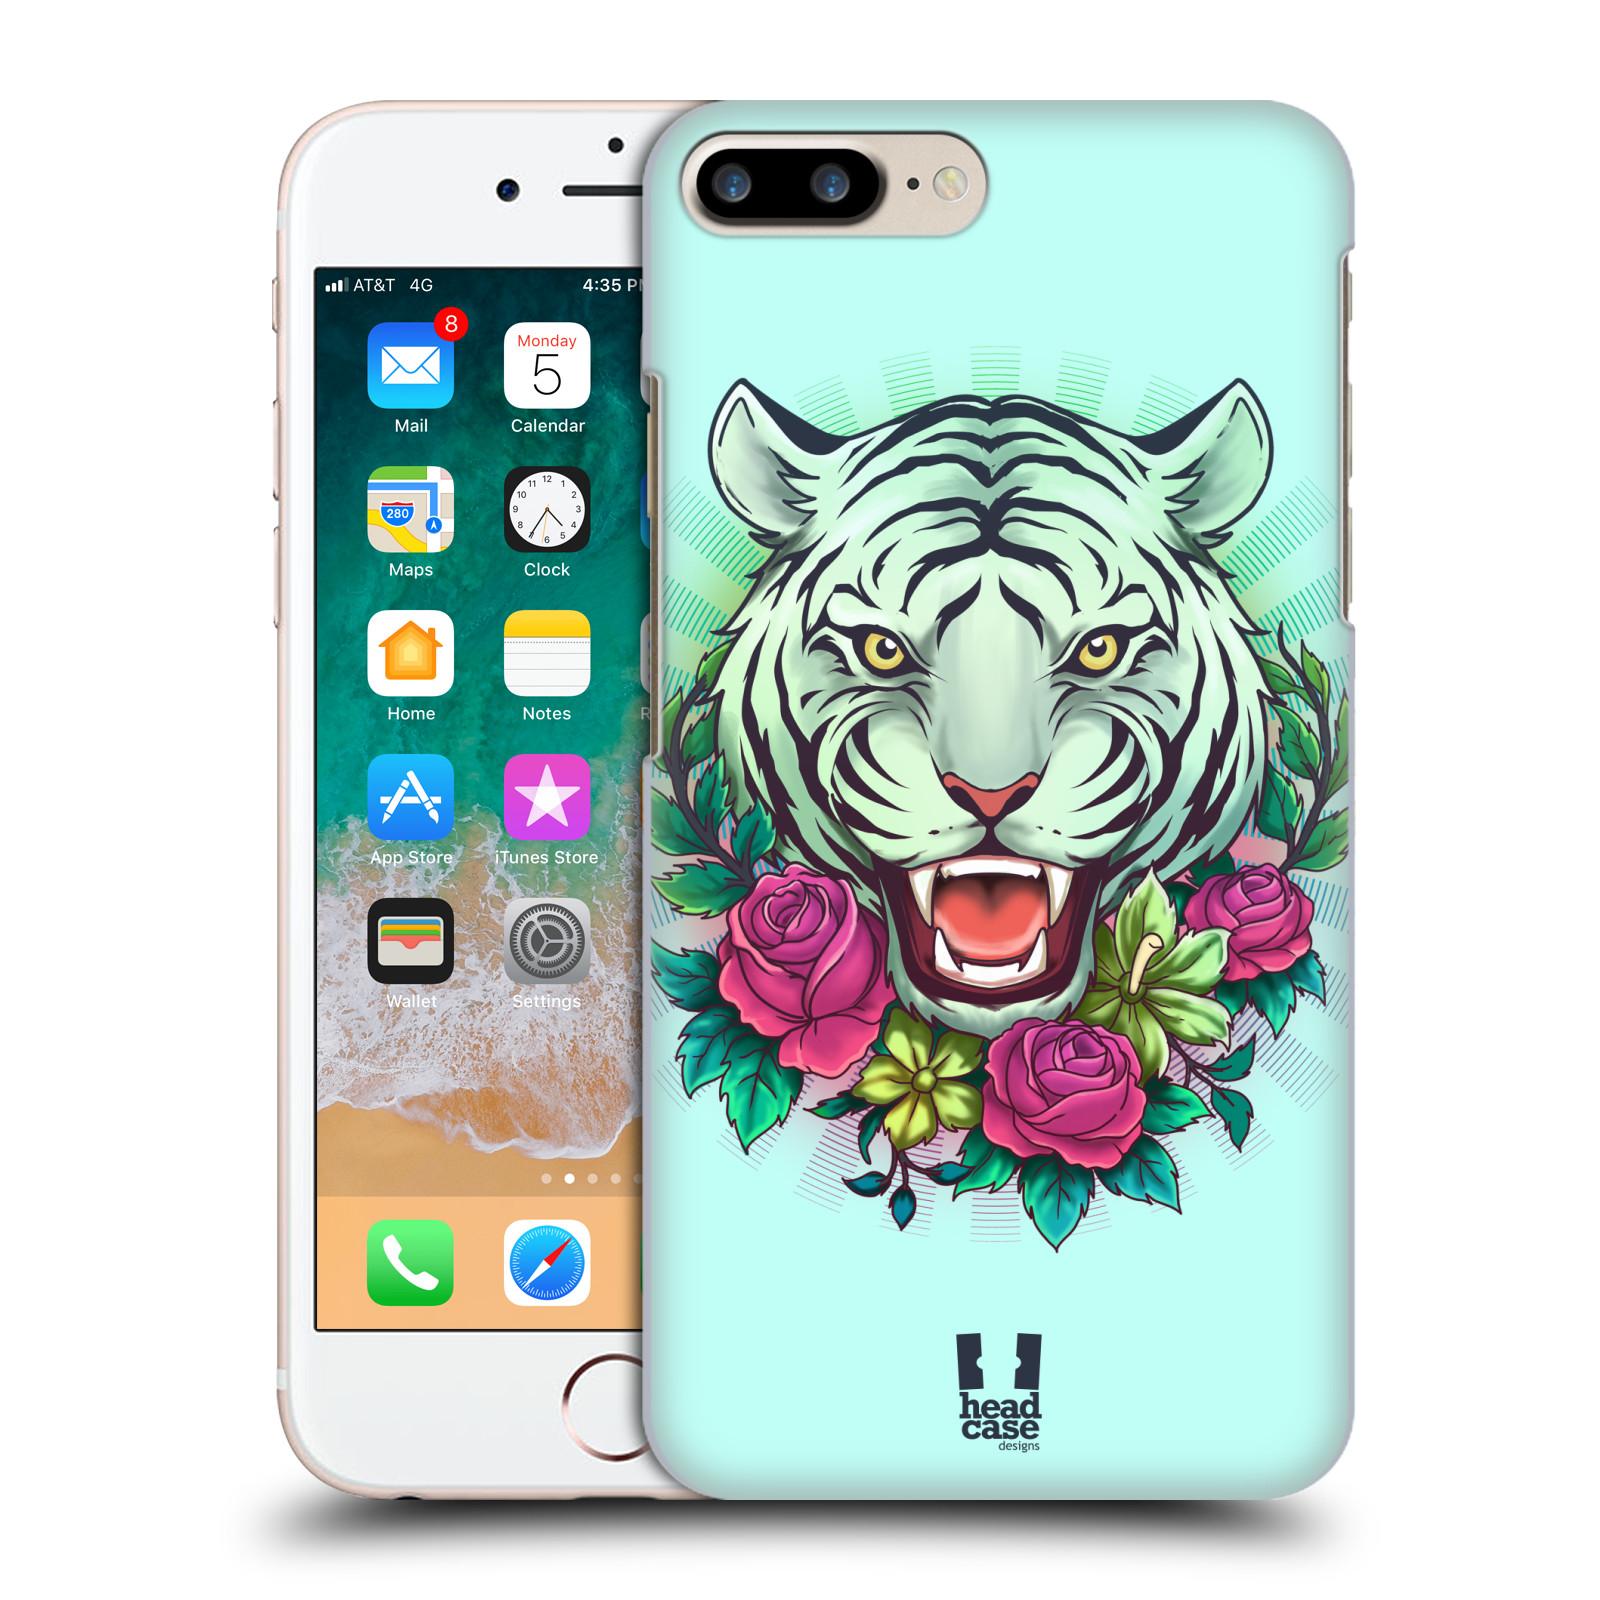 HEAD CASE plastový obal na mobil Apple Iphone 7 PLUS vzor Flóra a Fauna tygr